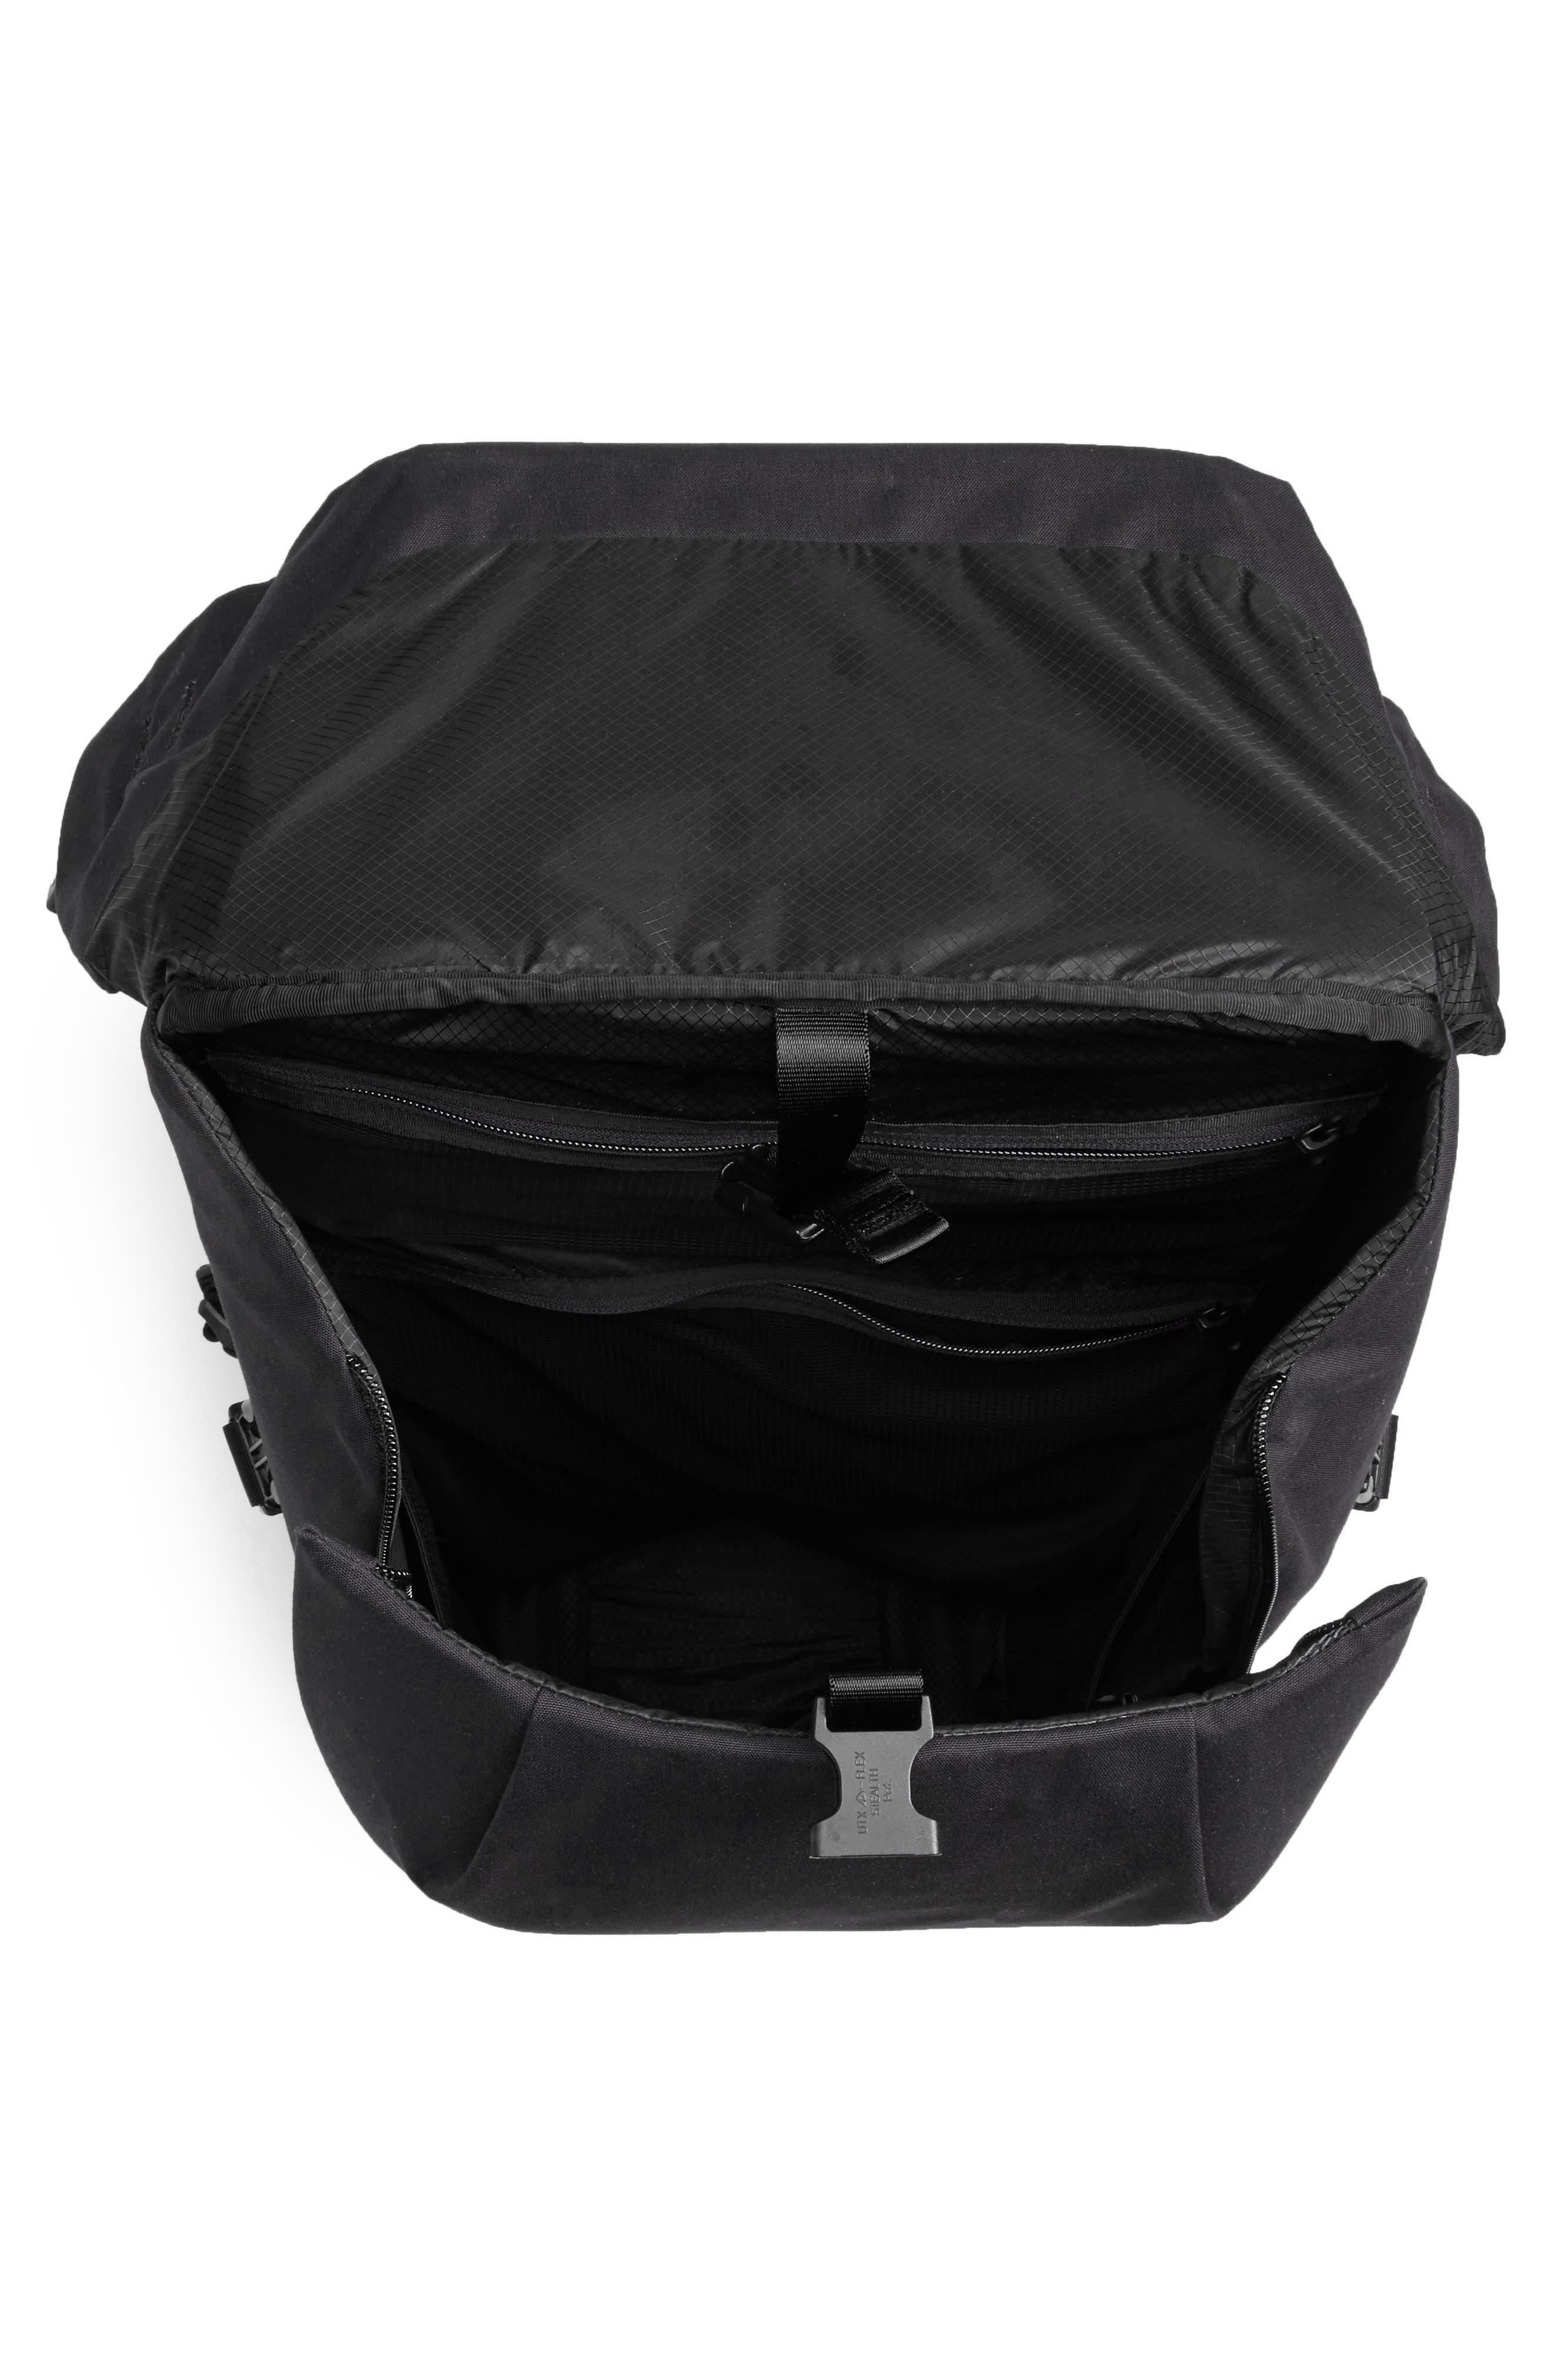 Locker Pack Lux Backpack,                             Alternate thumbnail 4, color,                             001